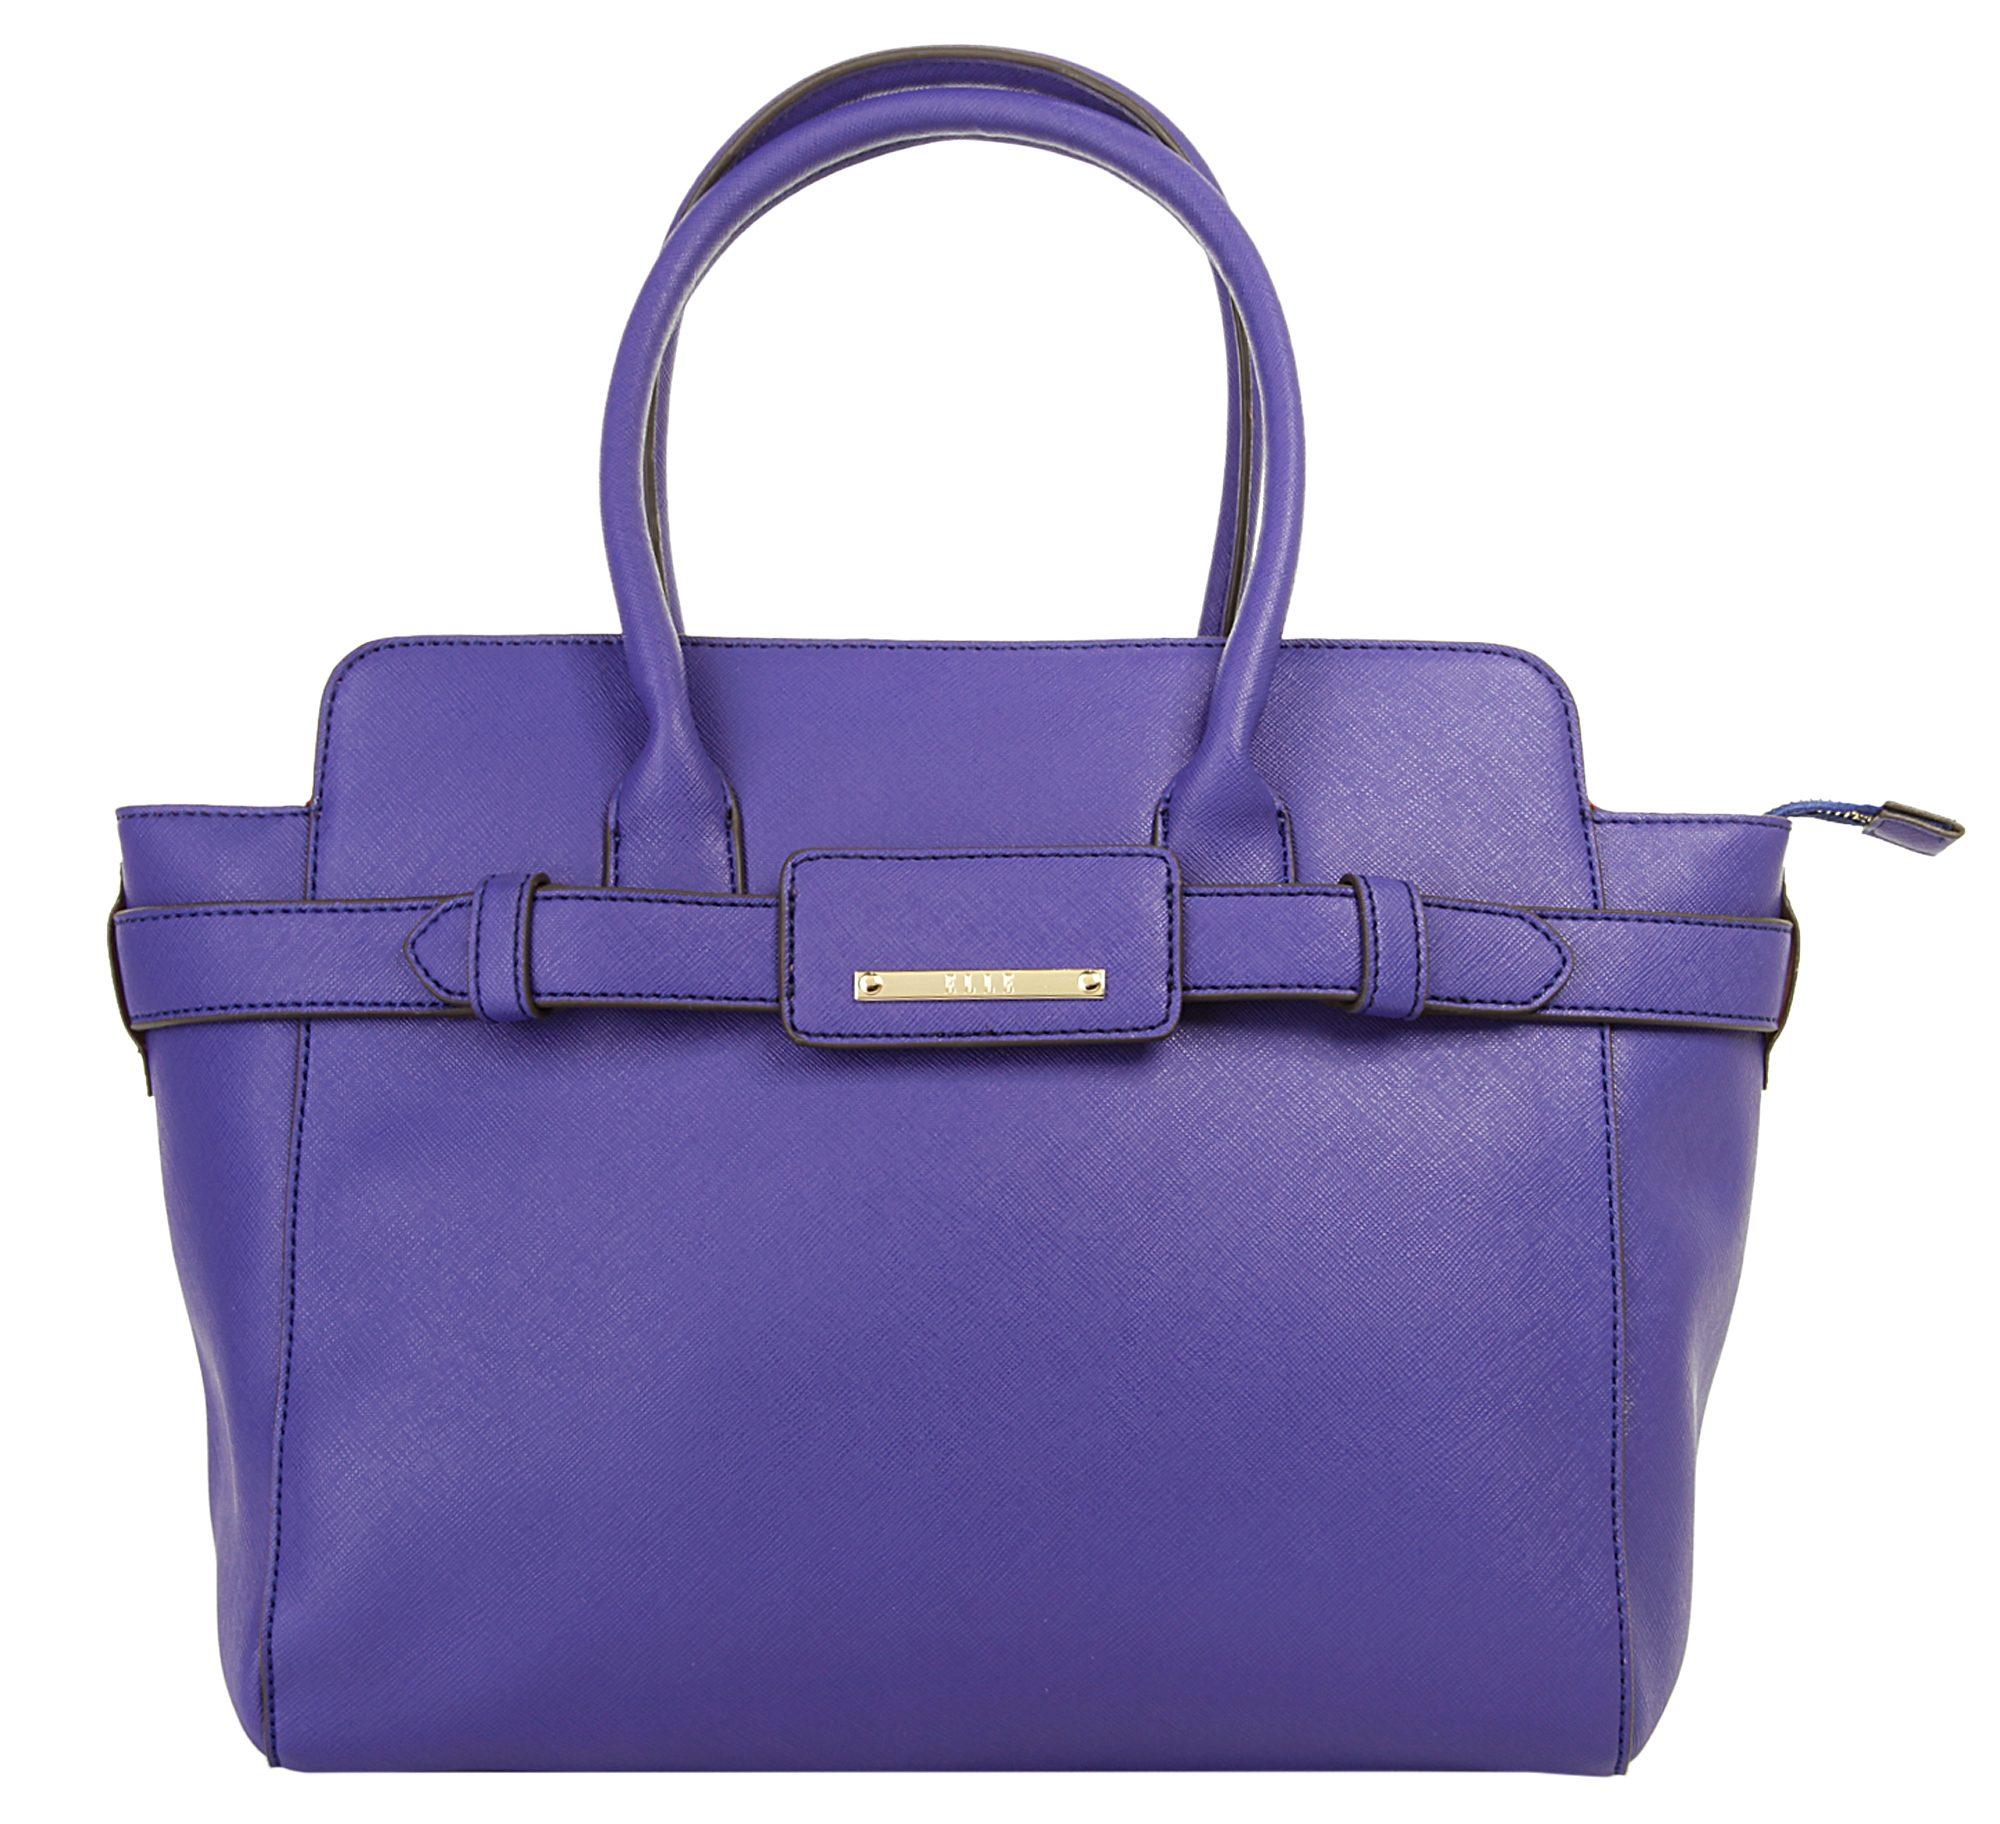 ELLE Damen Handtasche »Saffiano«